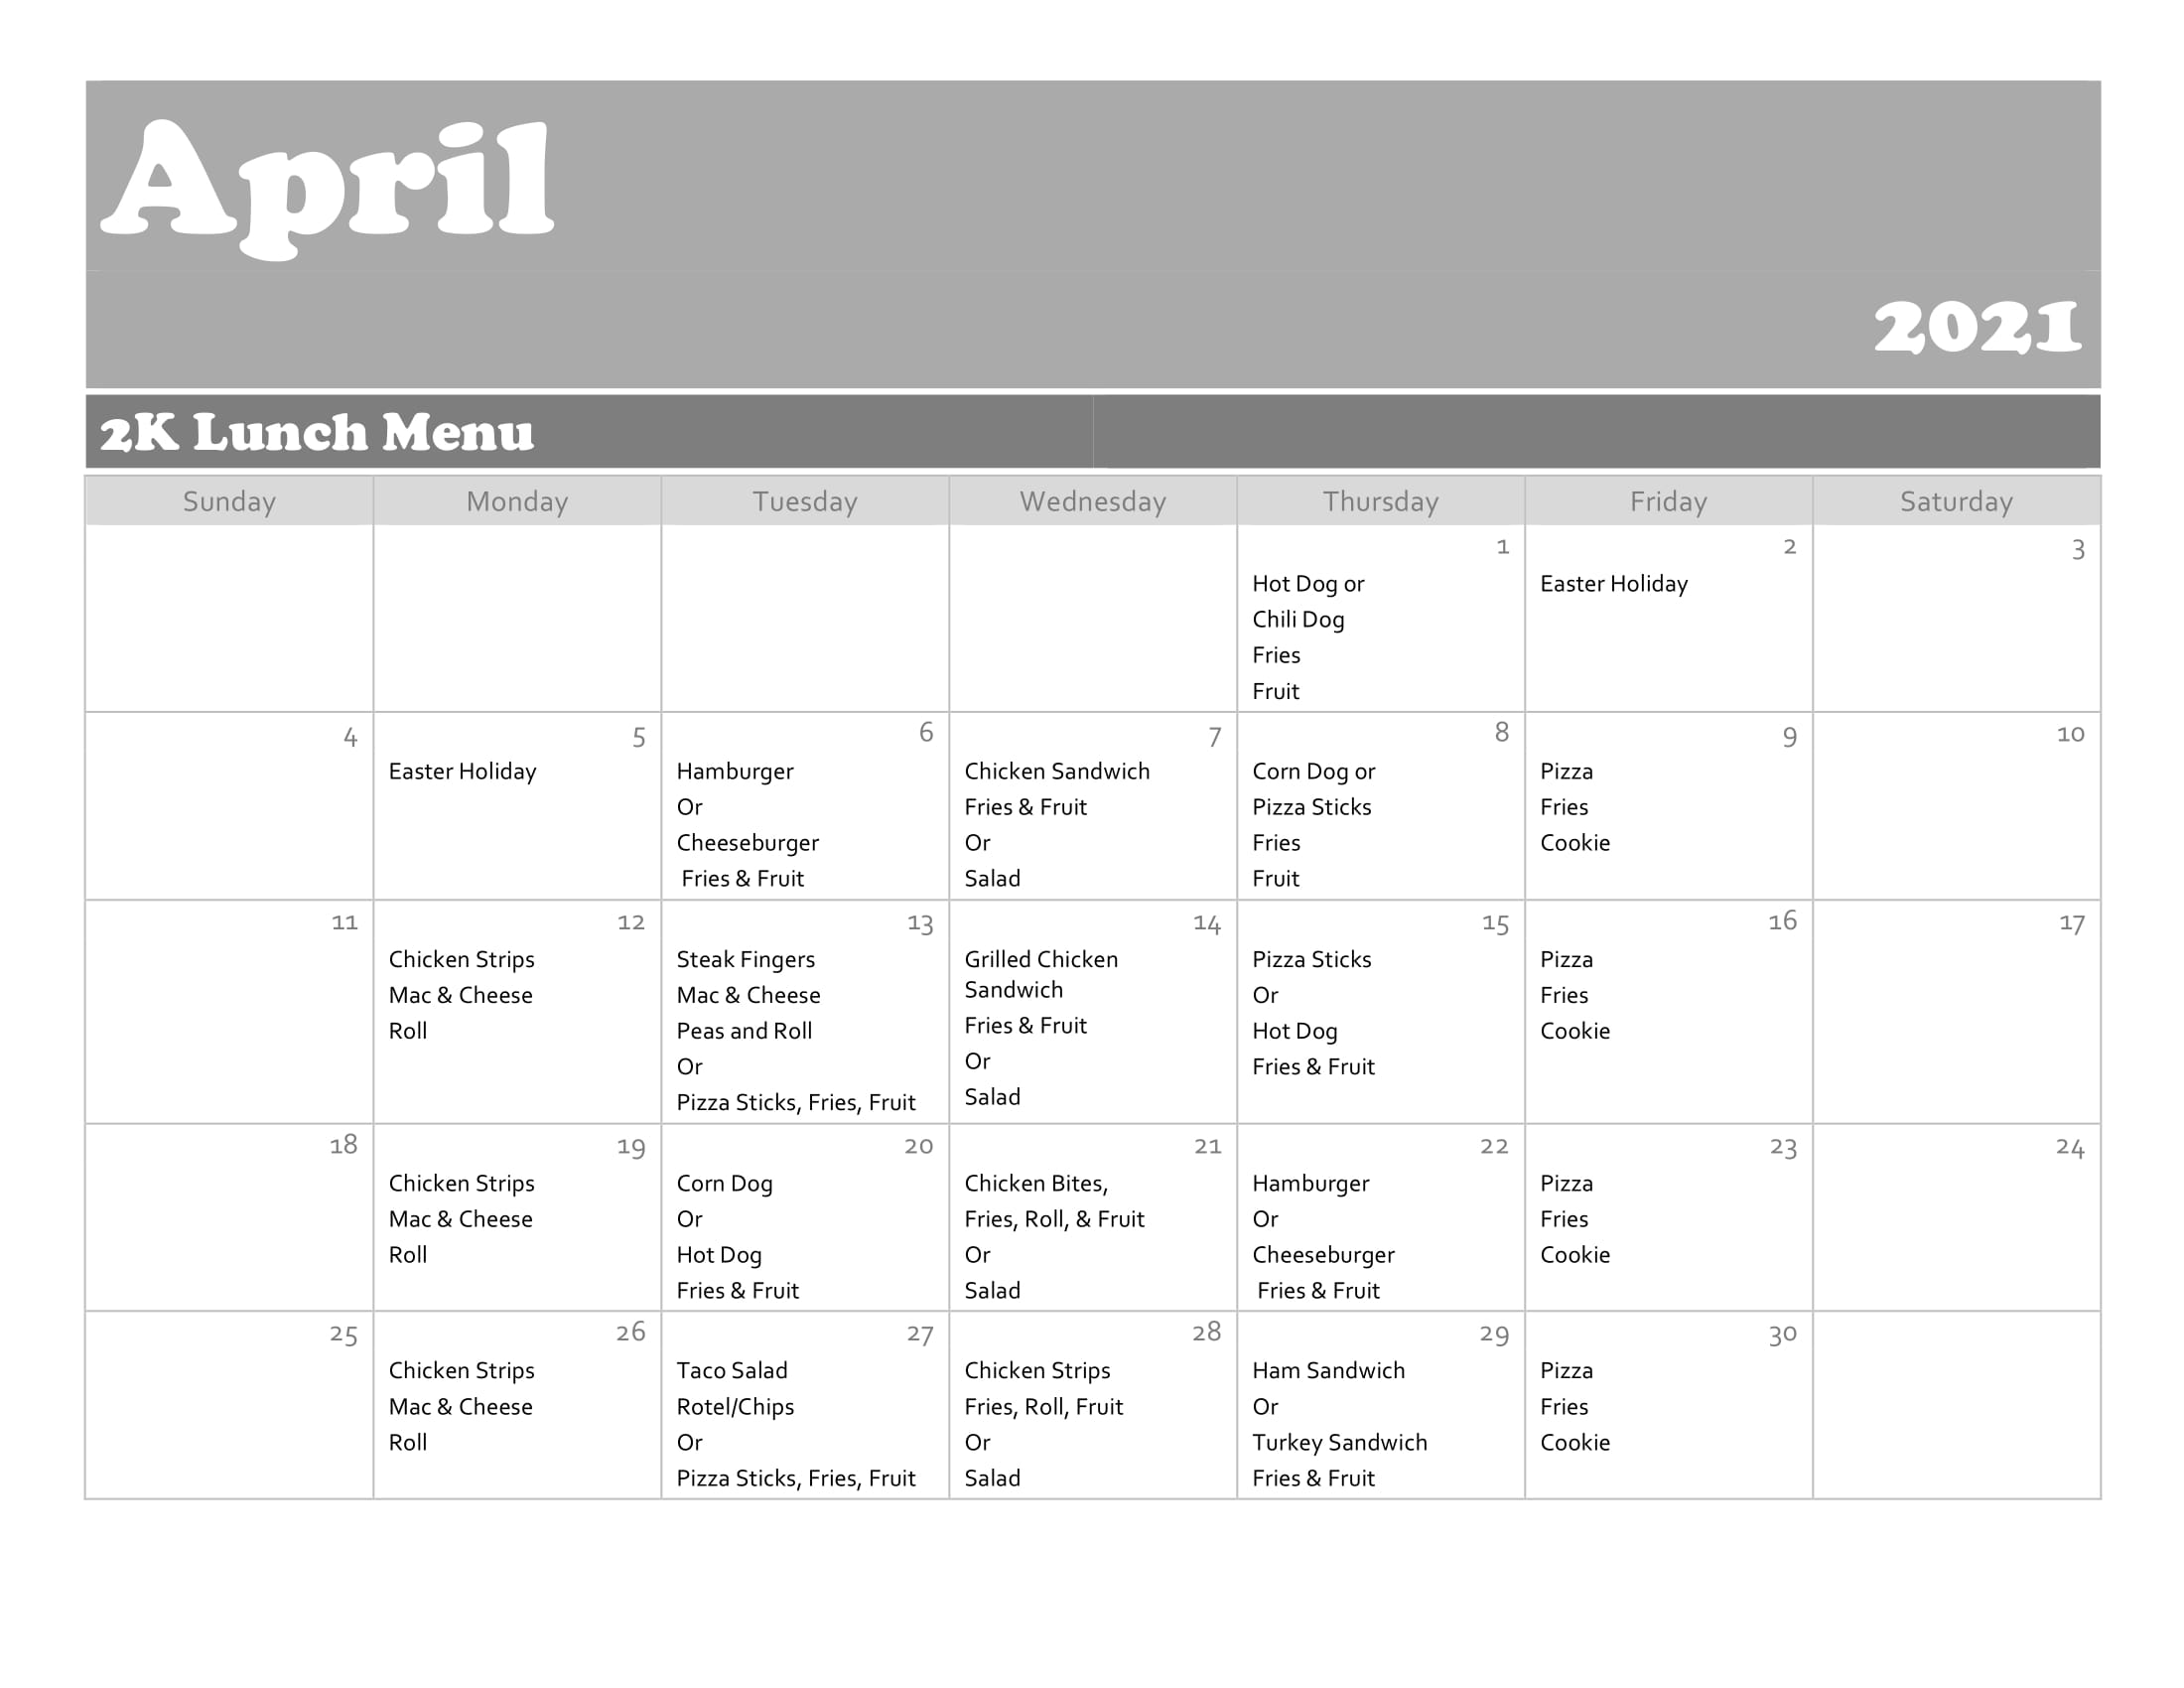 April Lunch Menu - 2K